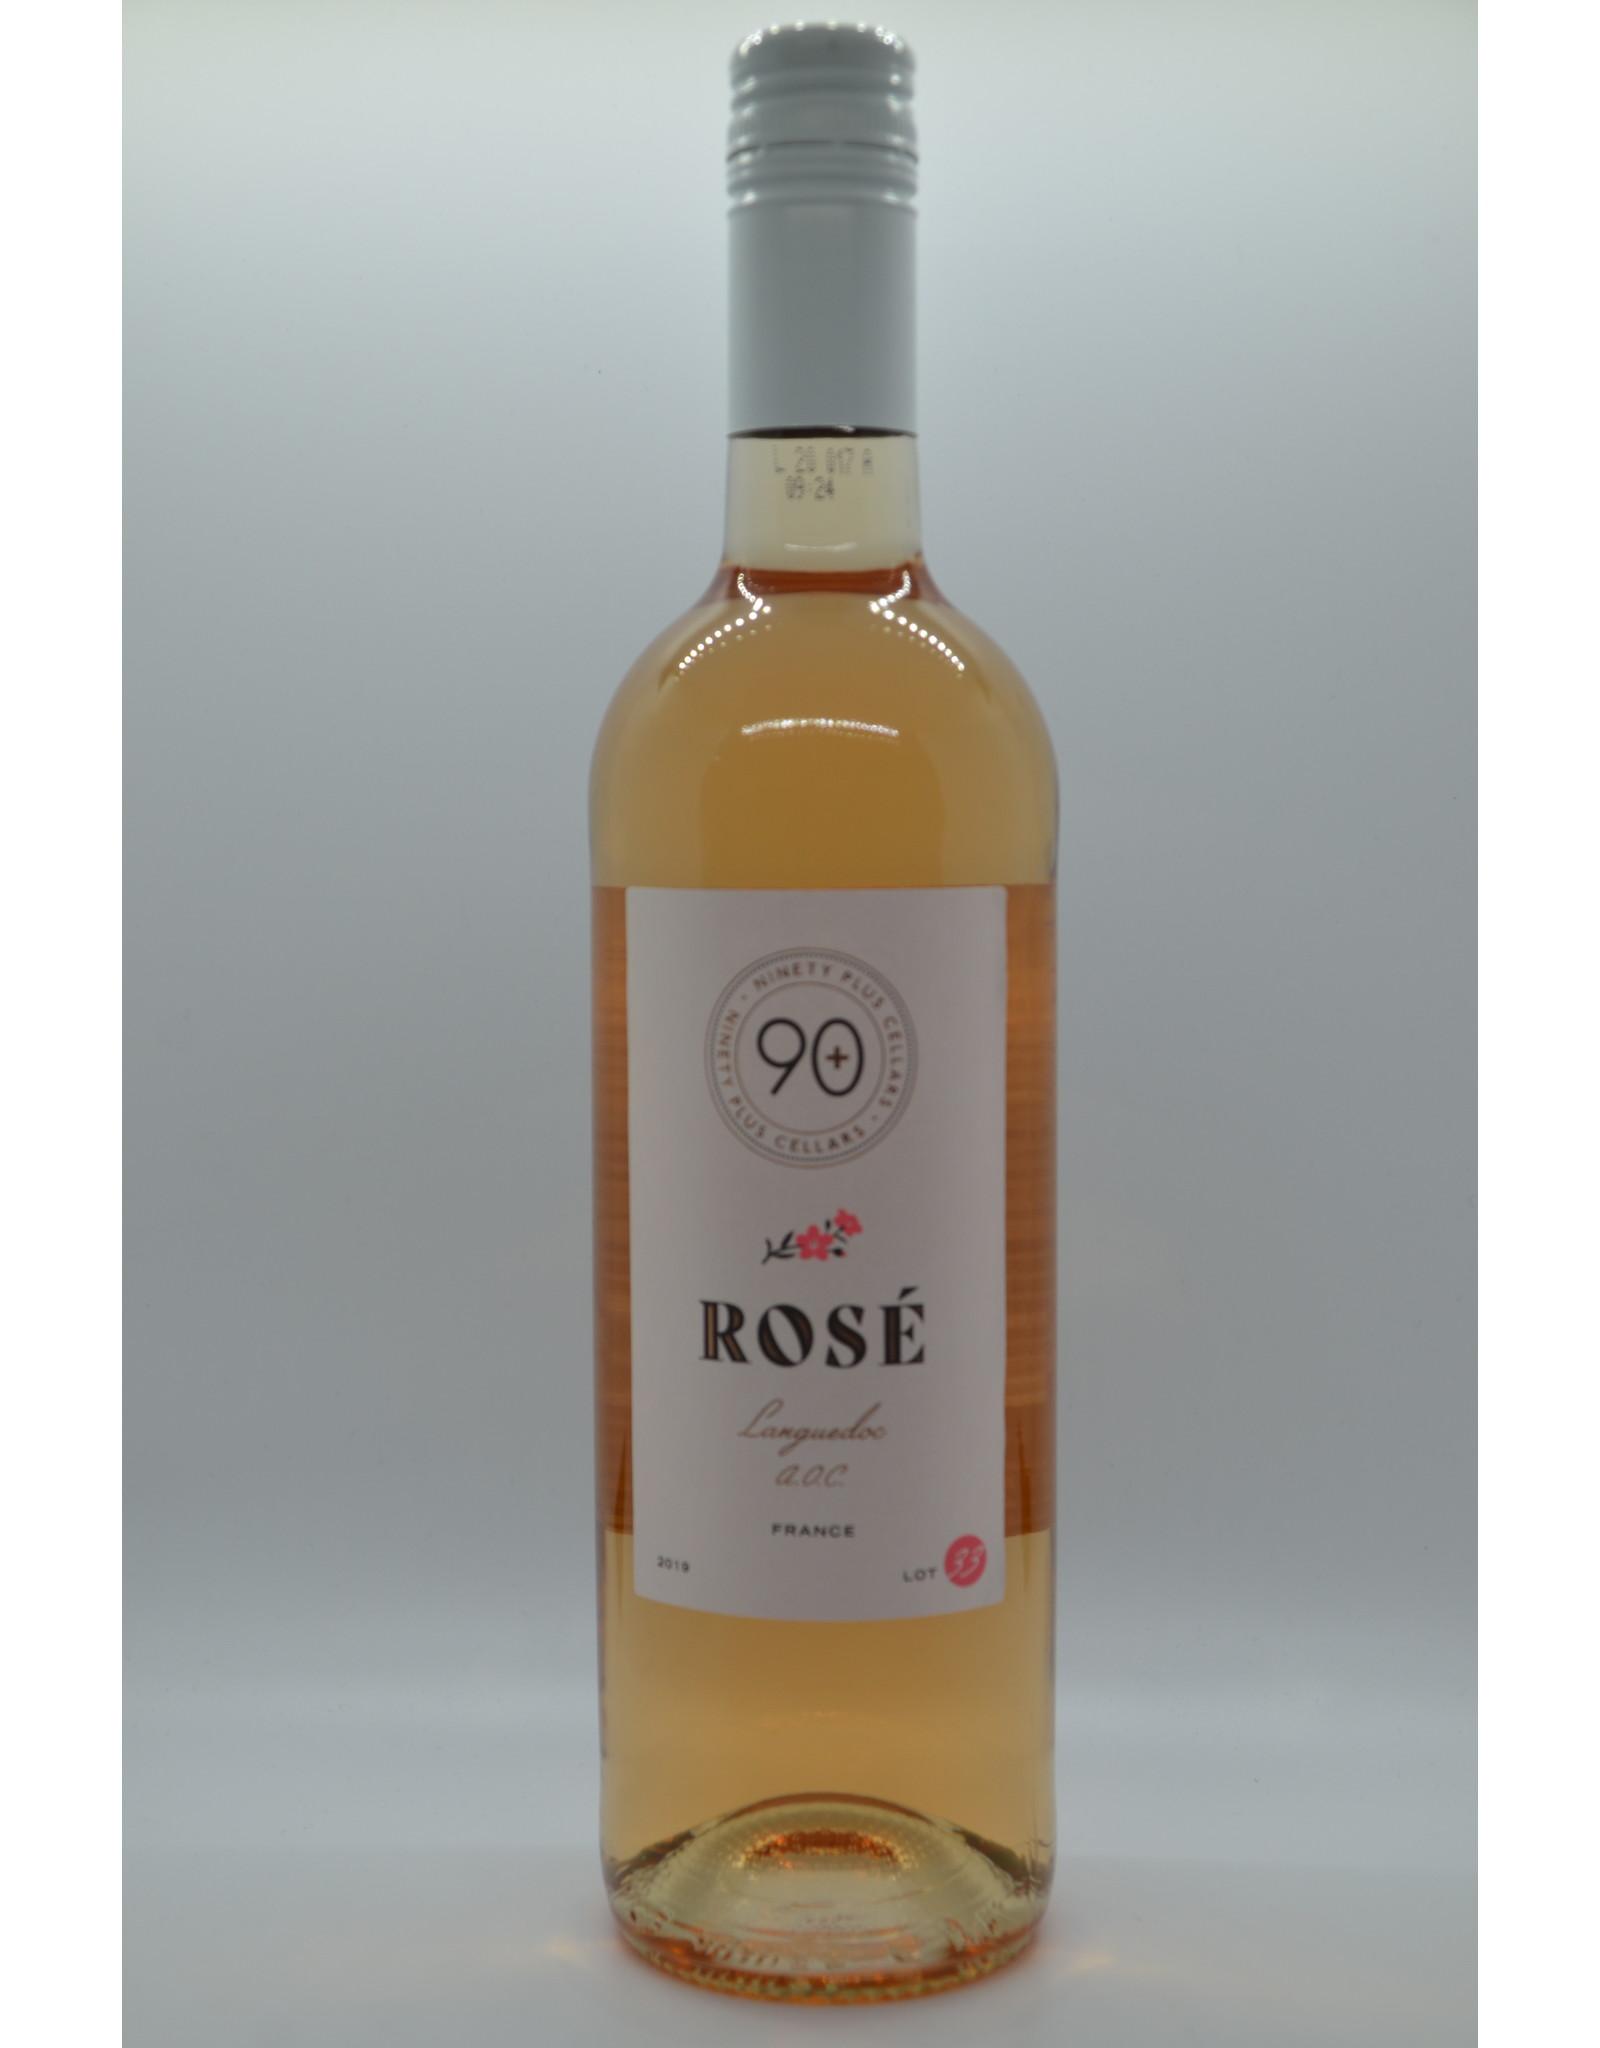 France 90+ Cellars Lot 33 Languedoc Rosé